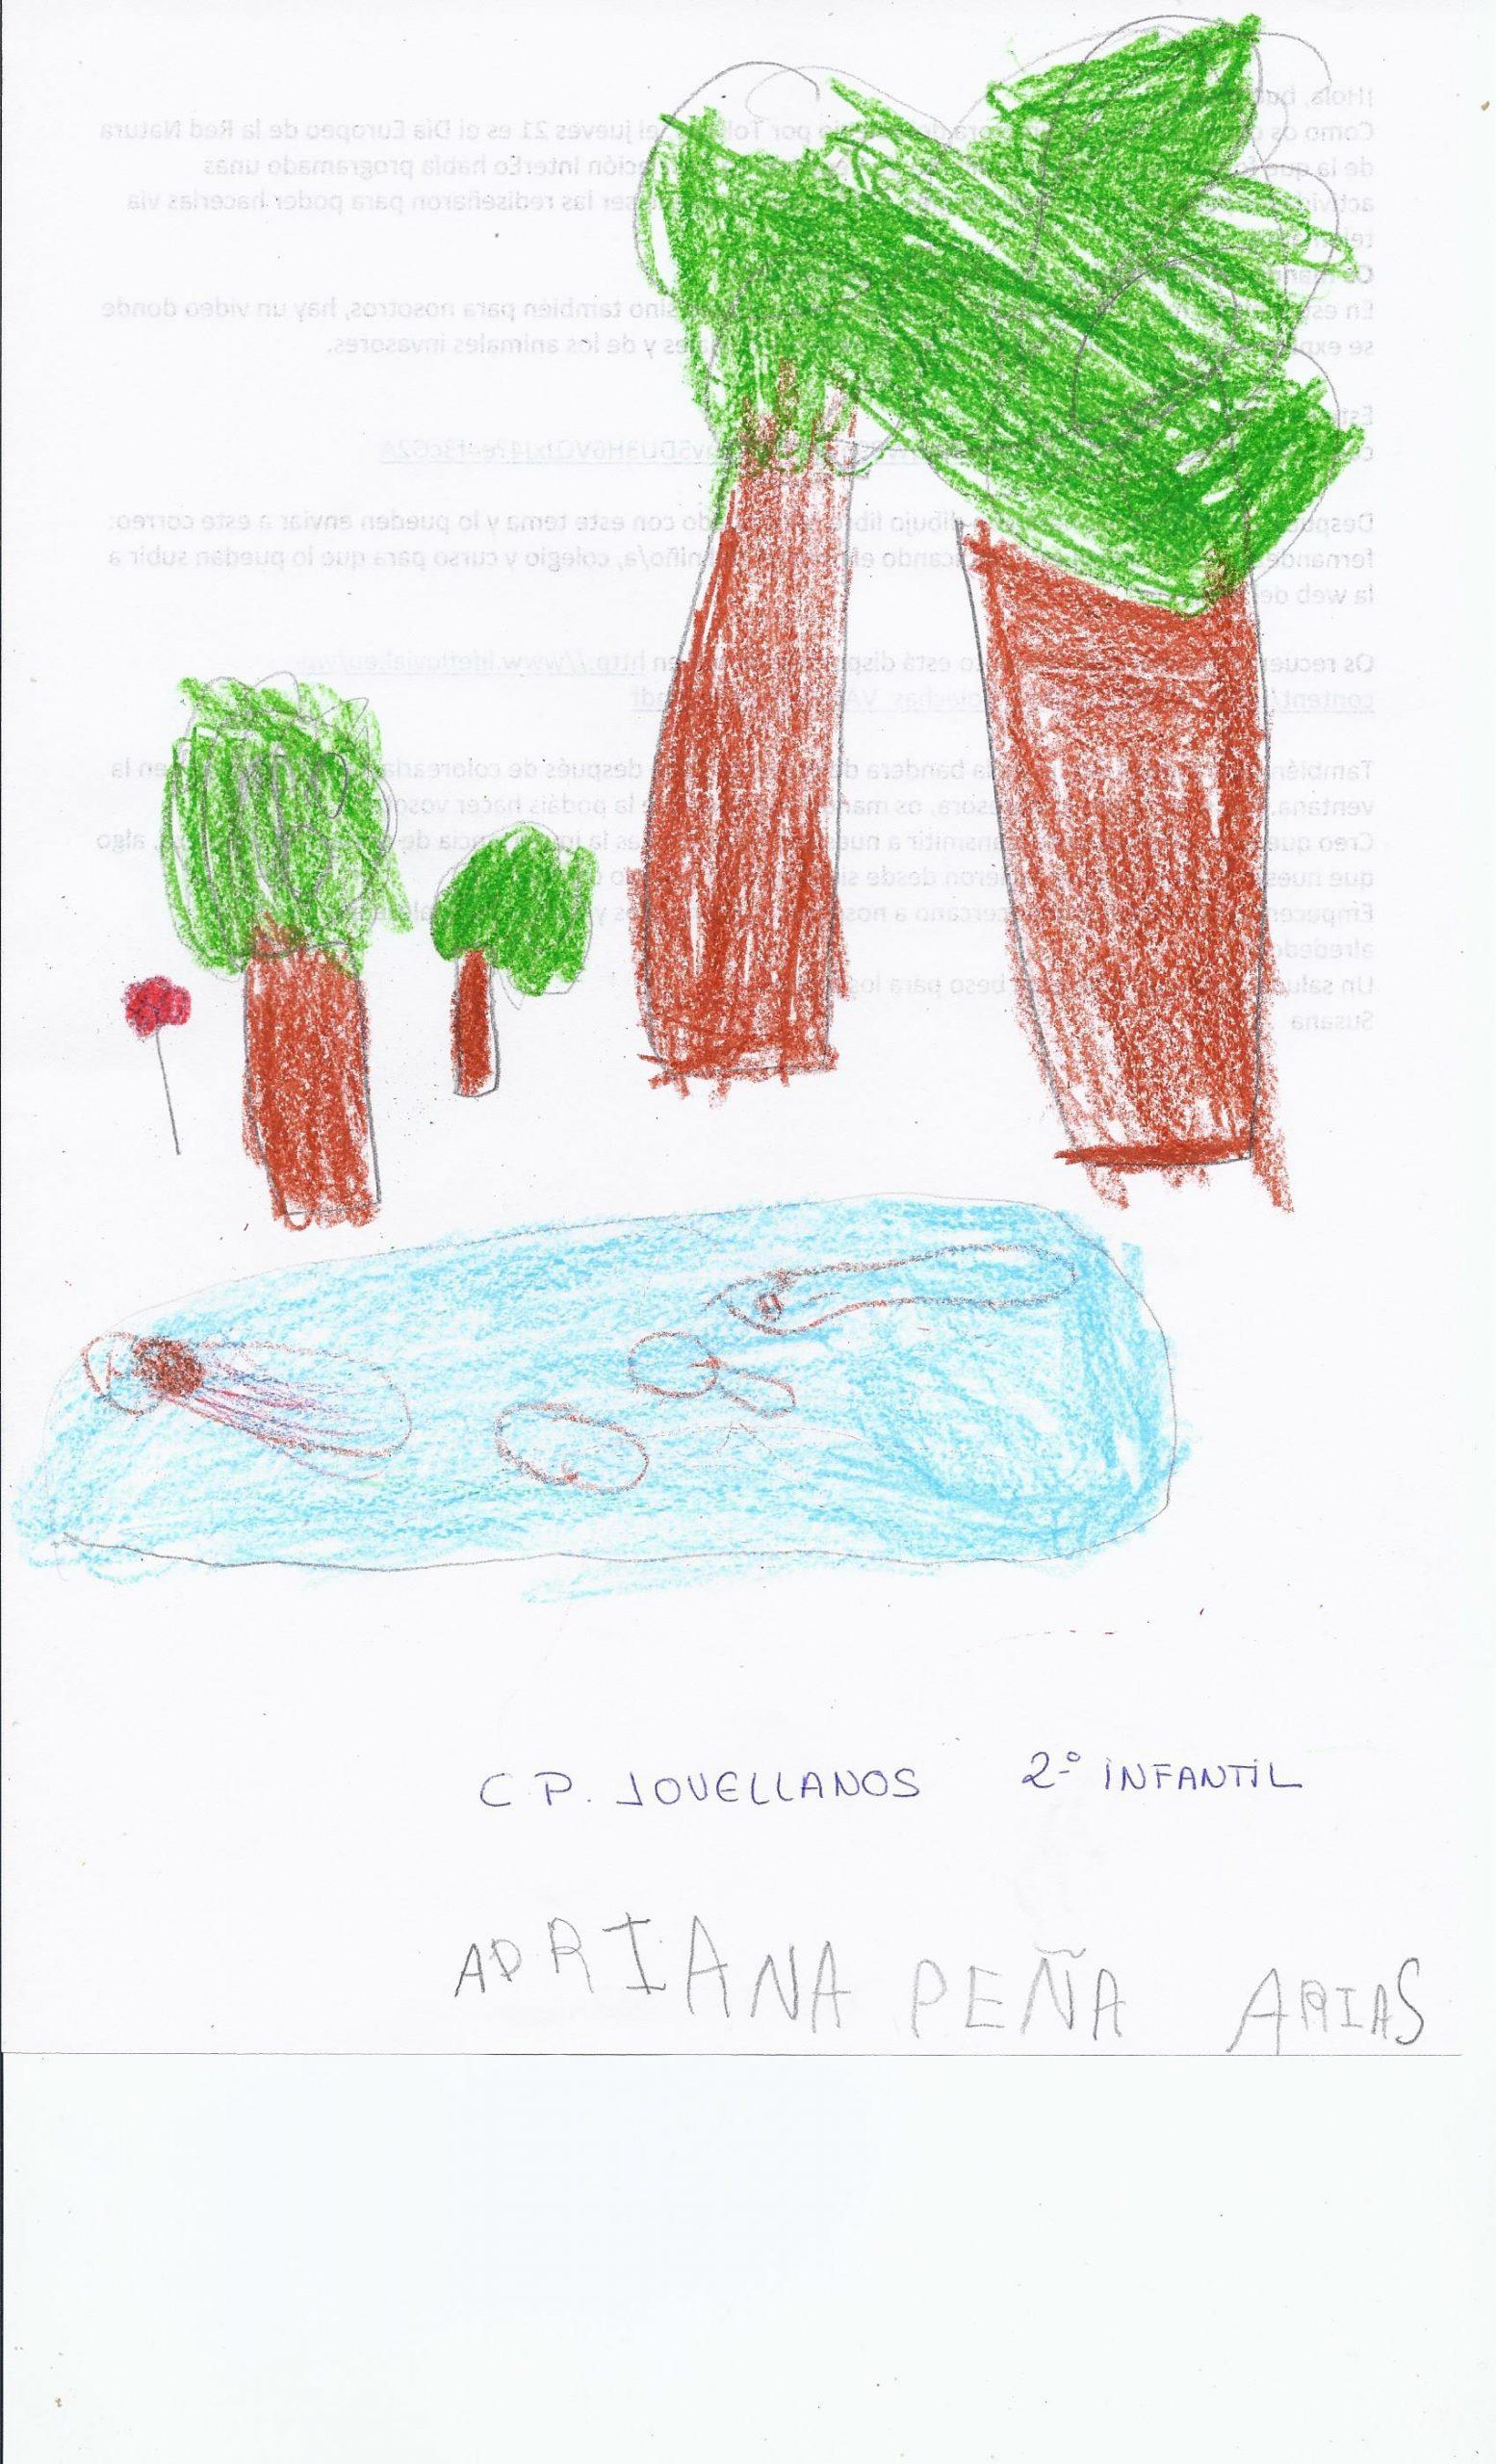 Adriana Peña Arias - 2º Infantil - CP Jovellanos